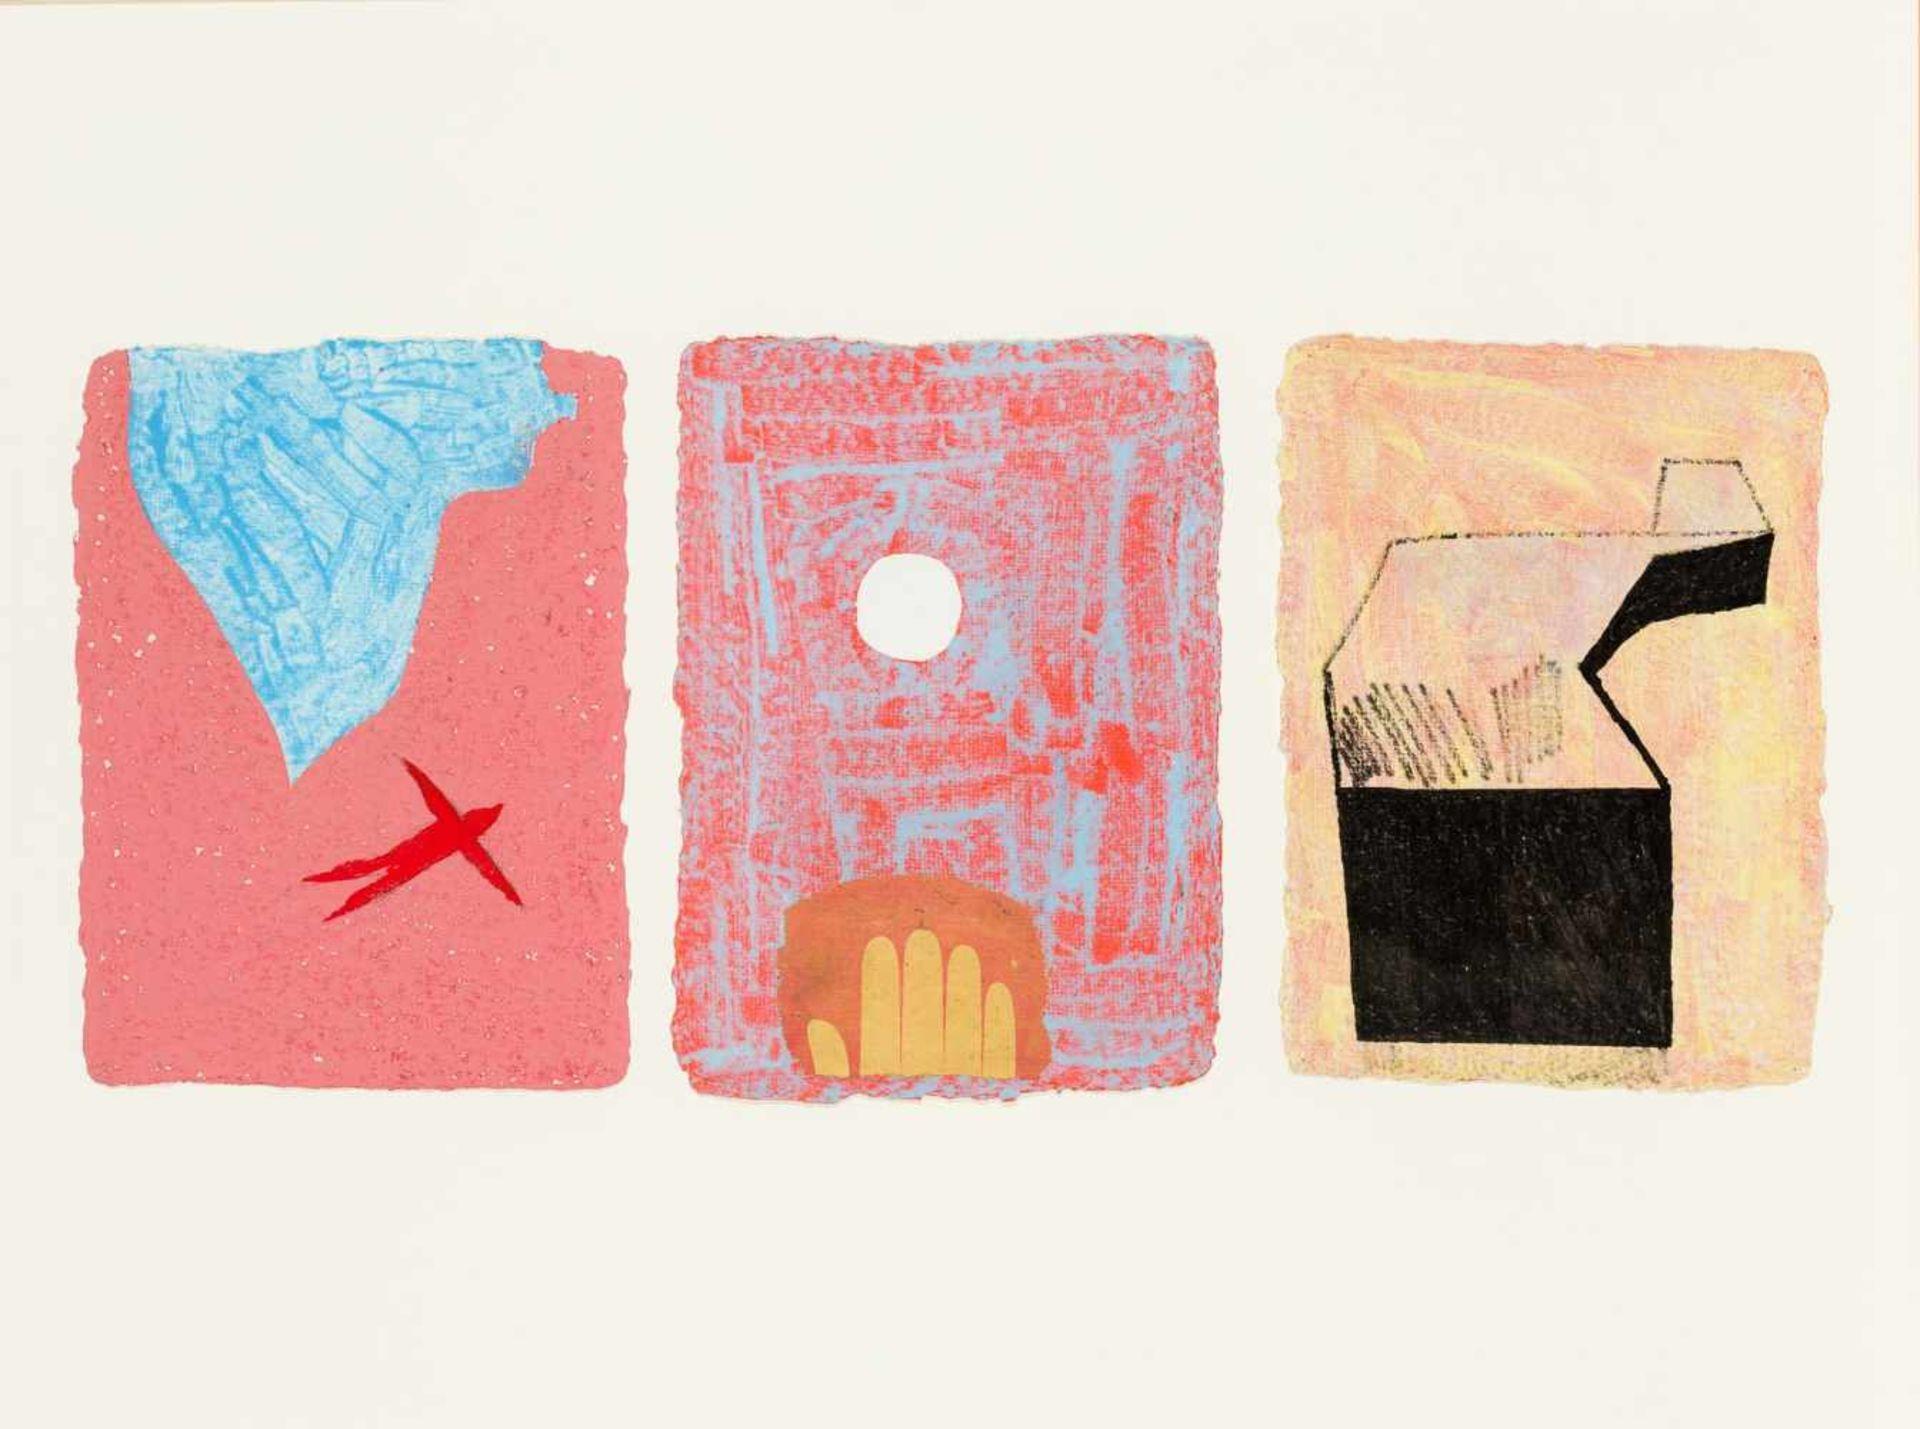 Los 41 - Johannes Zechner Klagenfurt 1953 geb. MASADA (Israel) Triptychon Mischtechnik auf Karton je 31 x